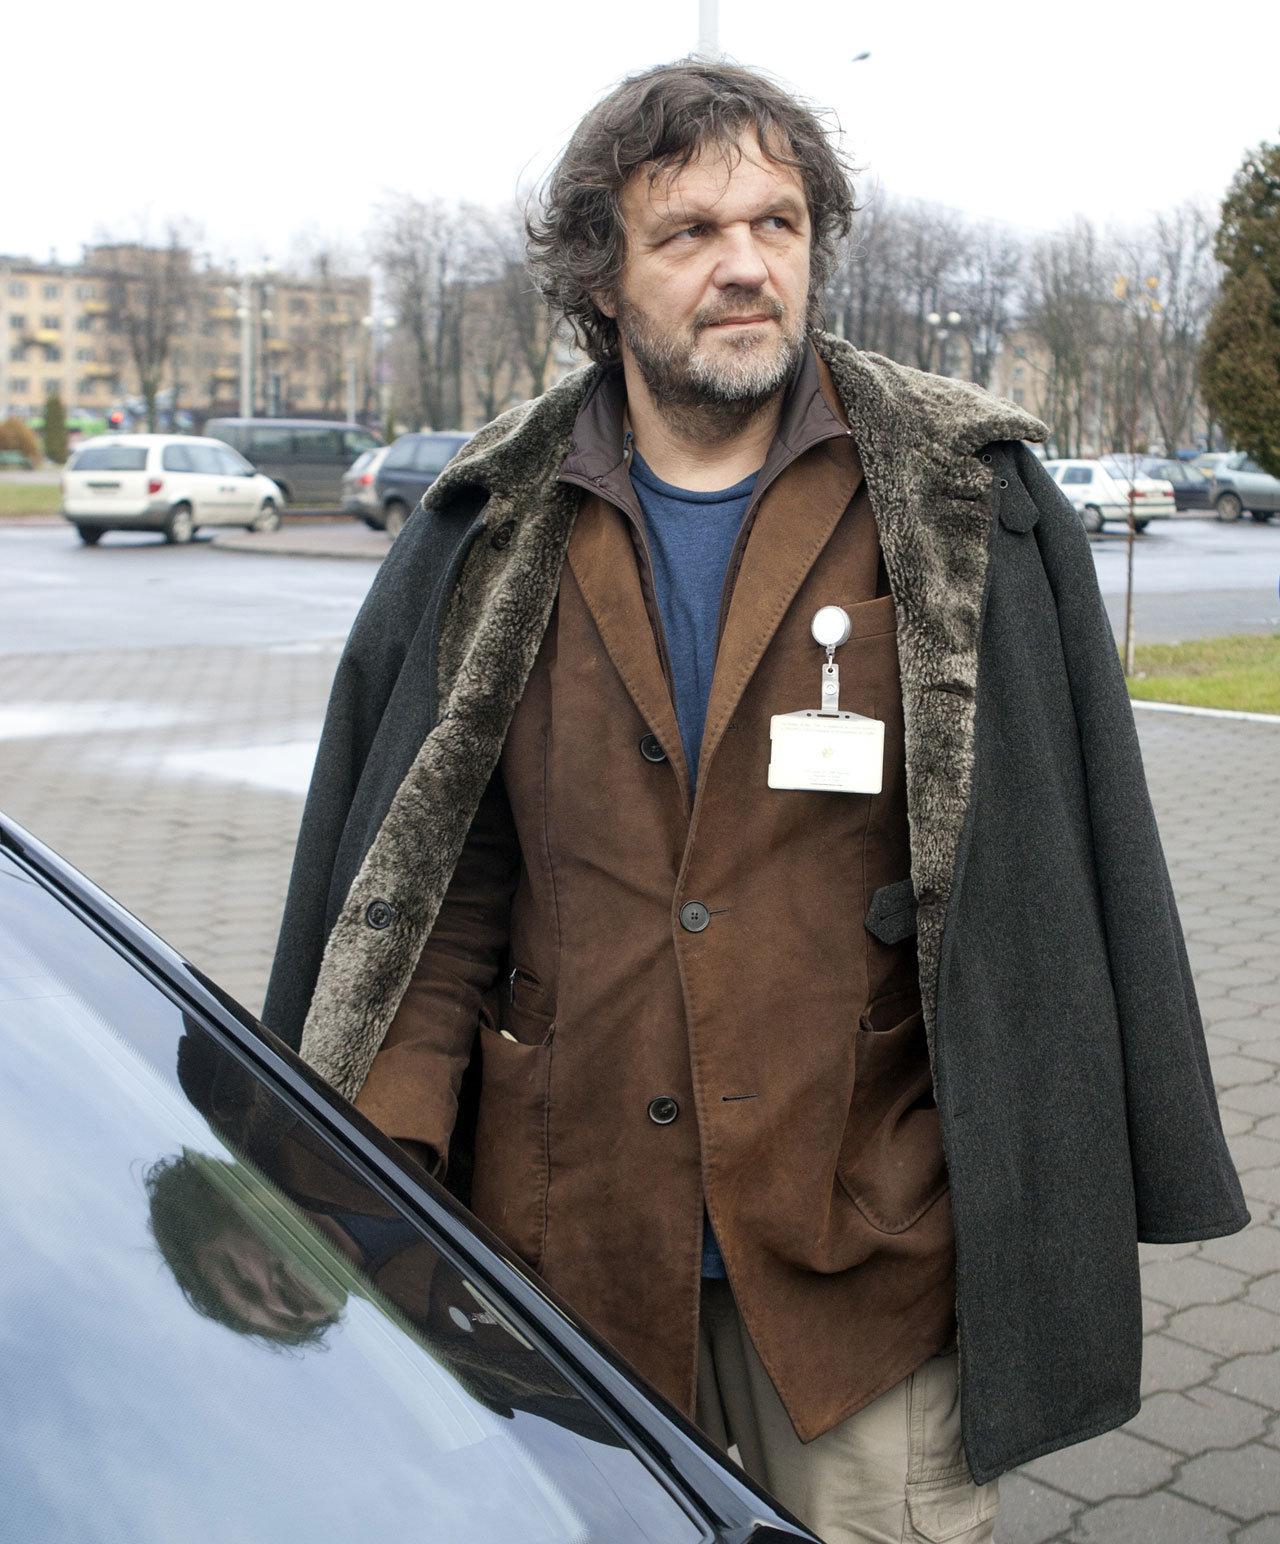 Эмир Кустурица на кинофестивале Лiстапад в Минске